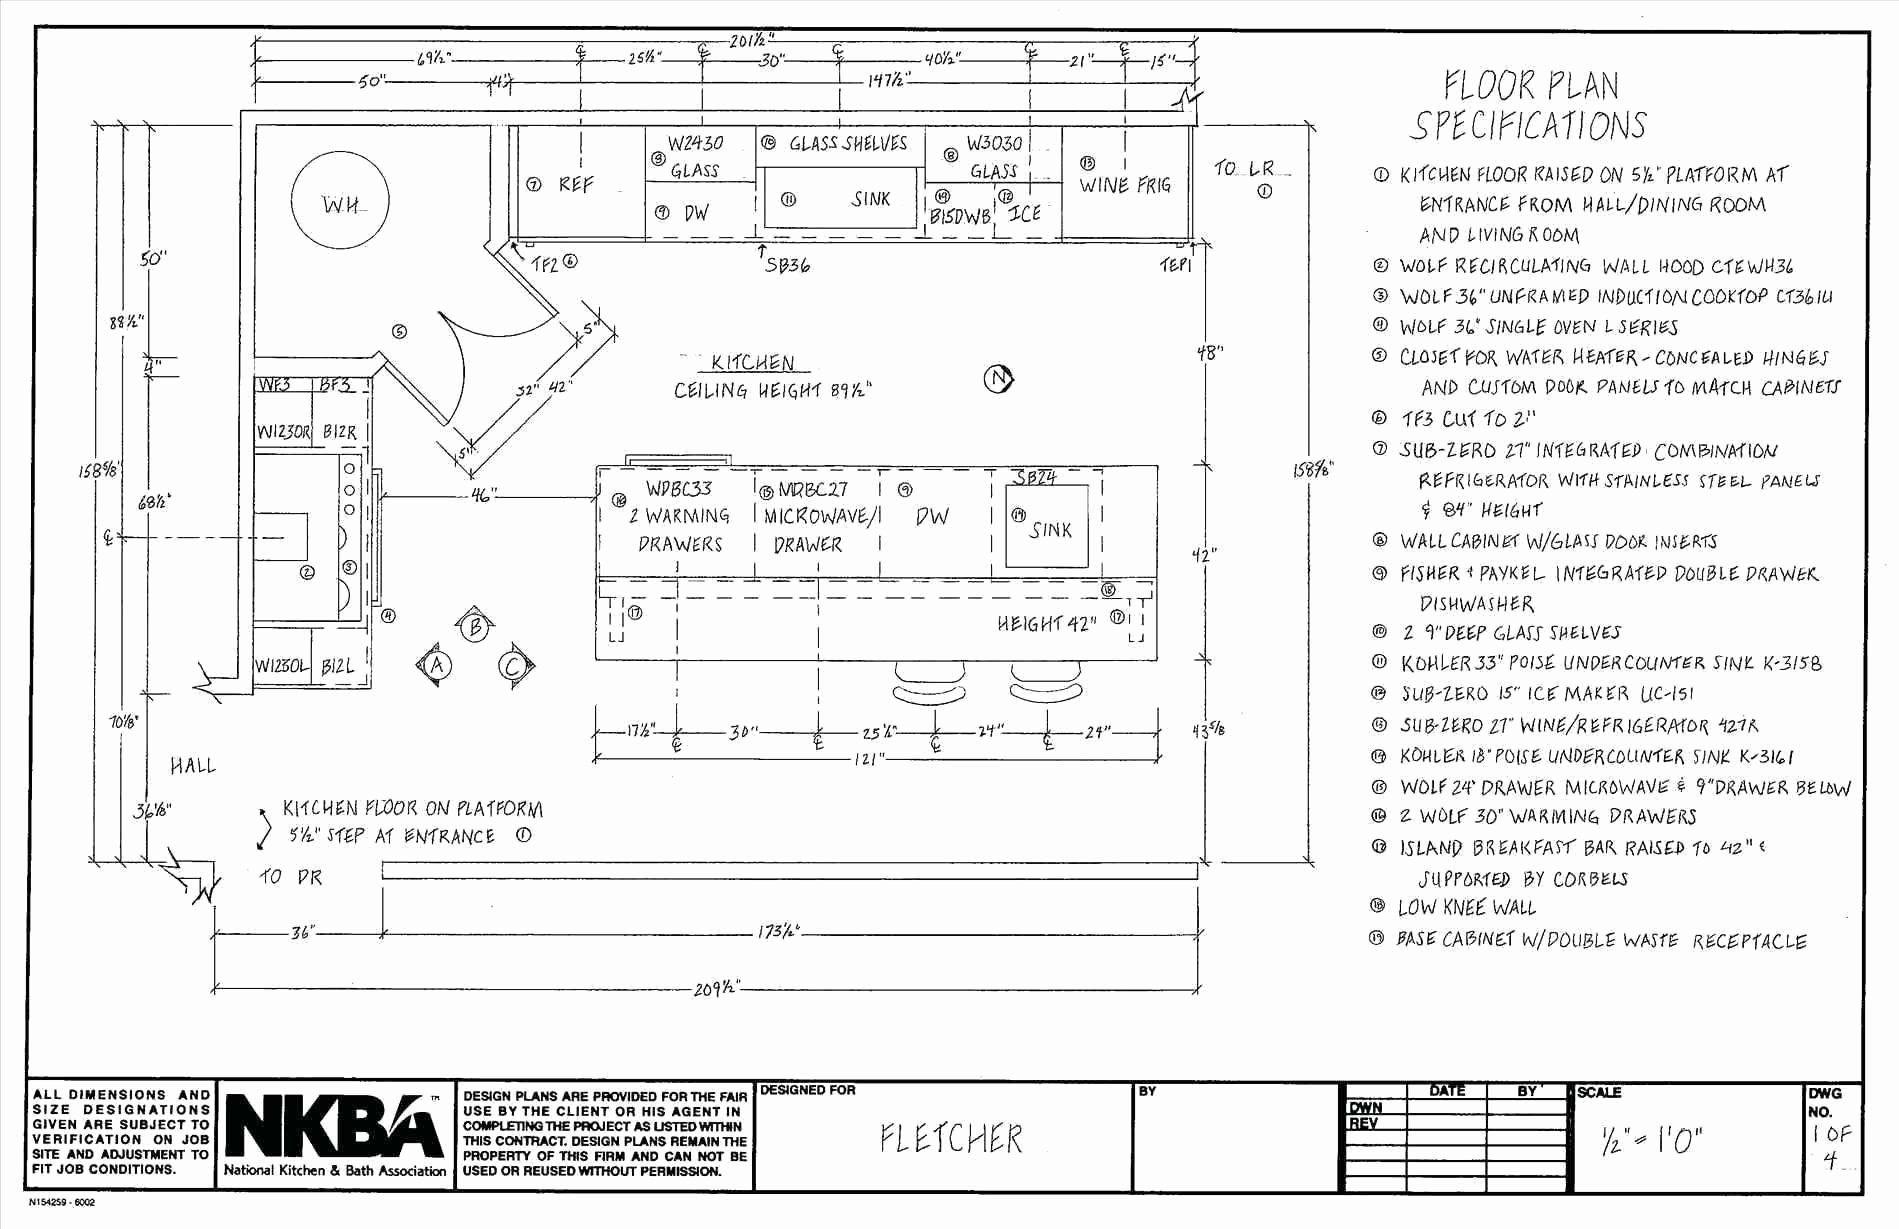 Home Renovation Project Plan Template Excel New Home Renovation Project Plan Template Free Temp Kitchen Layout Plans Kitchen Floor Plans Kitchen Designs Layout